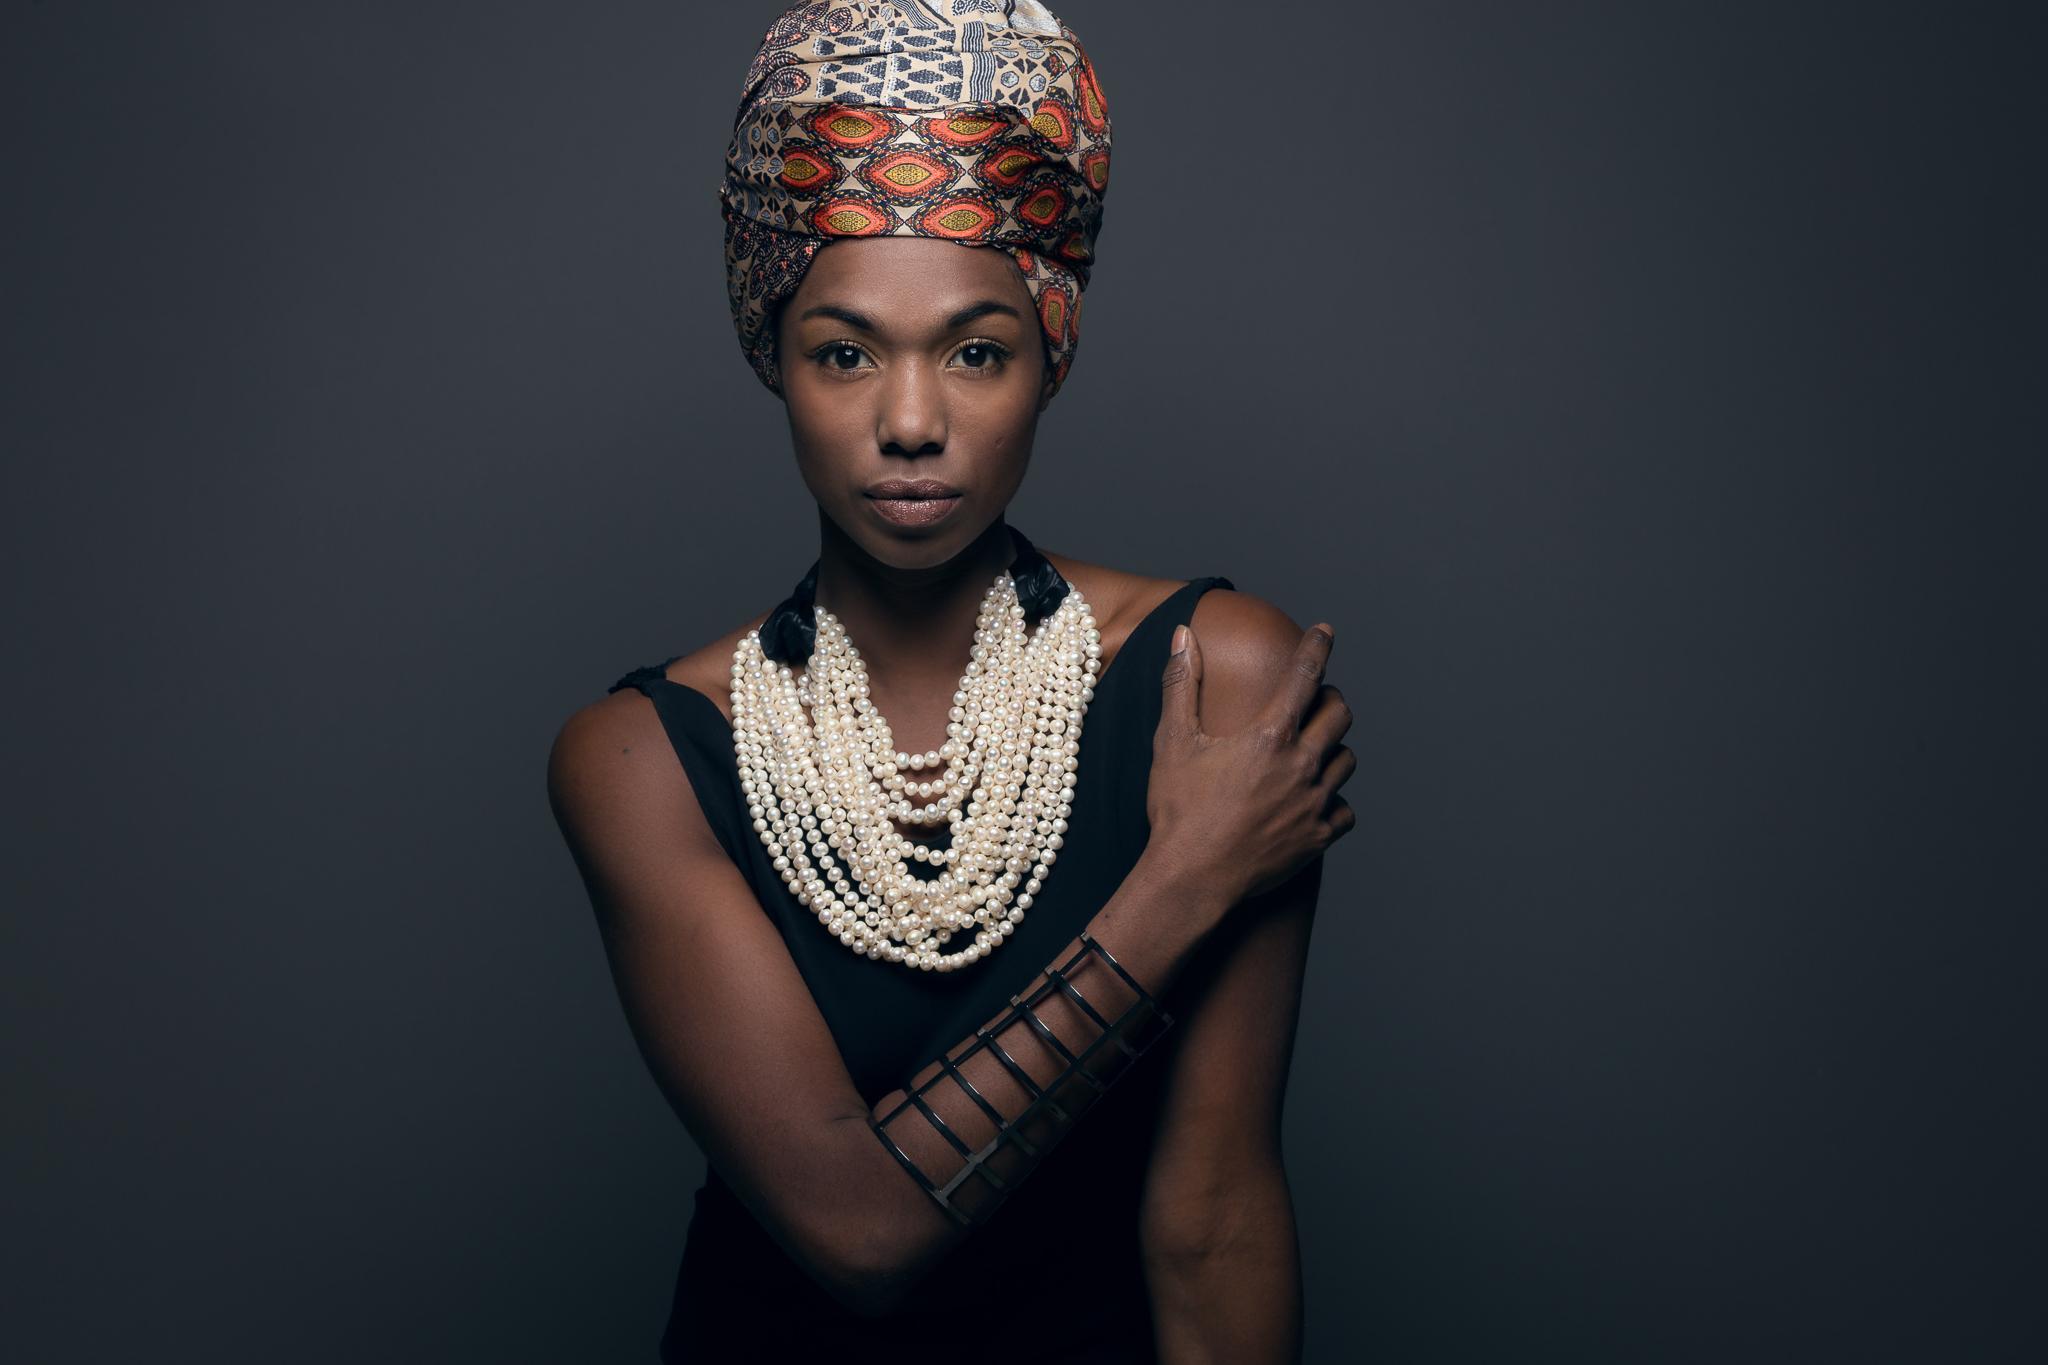 kostis sohoritis photography fashion Ukka Lelle lookbook 02.jpg